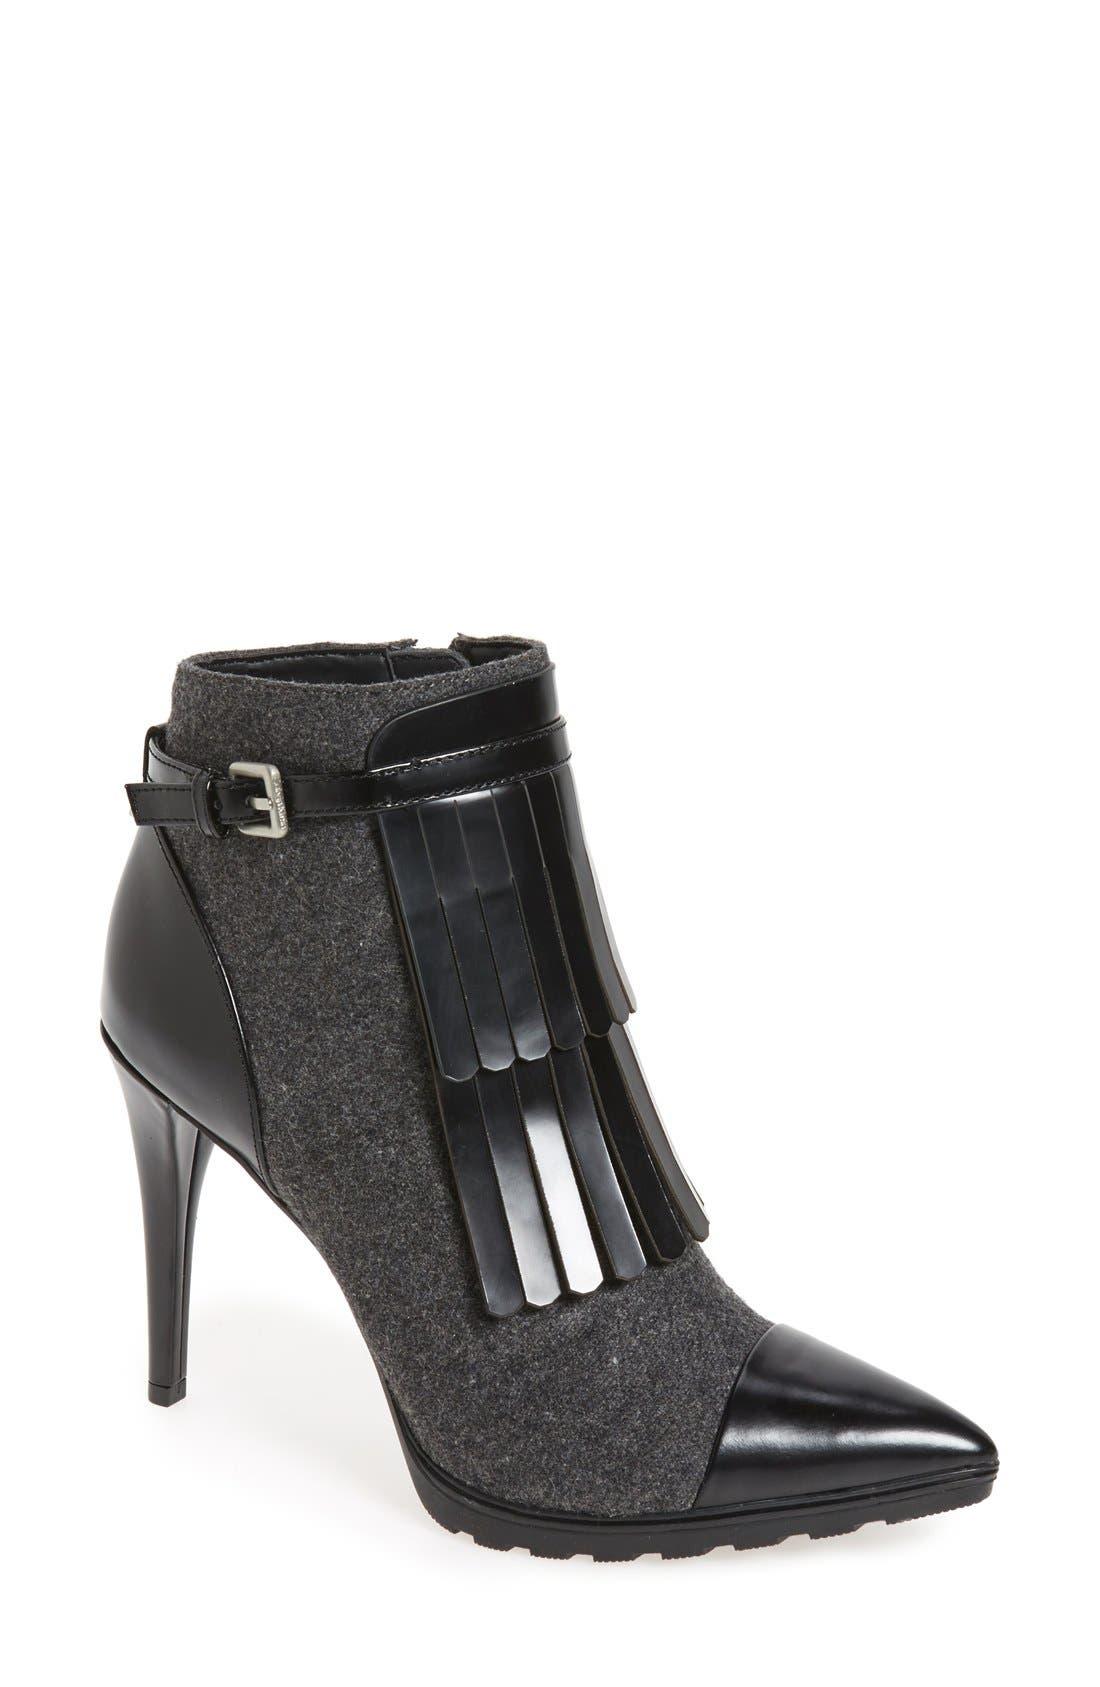 Main Image - Calvin Klein 'Makena' Pointy Toe Kiltie Bootie ...